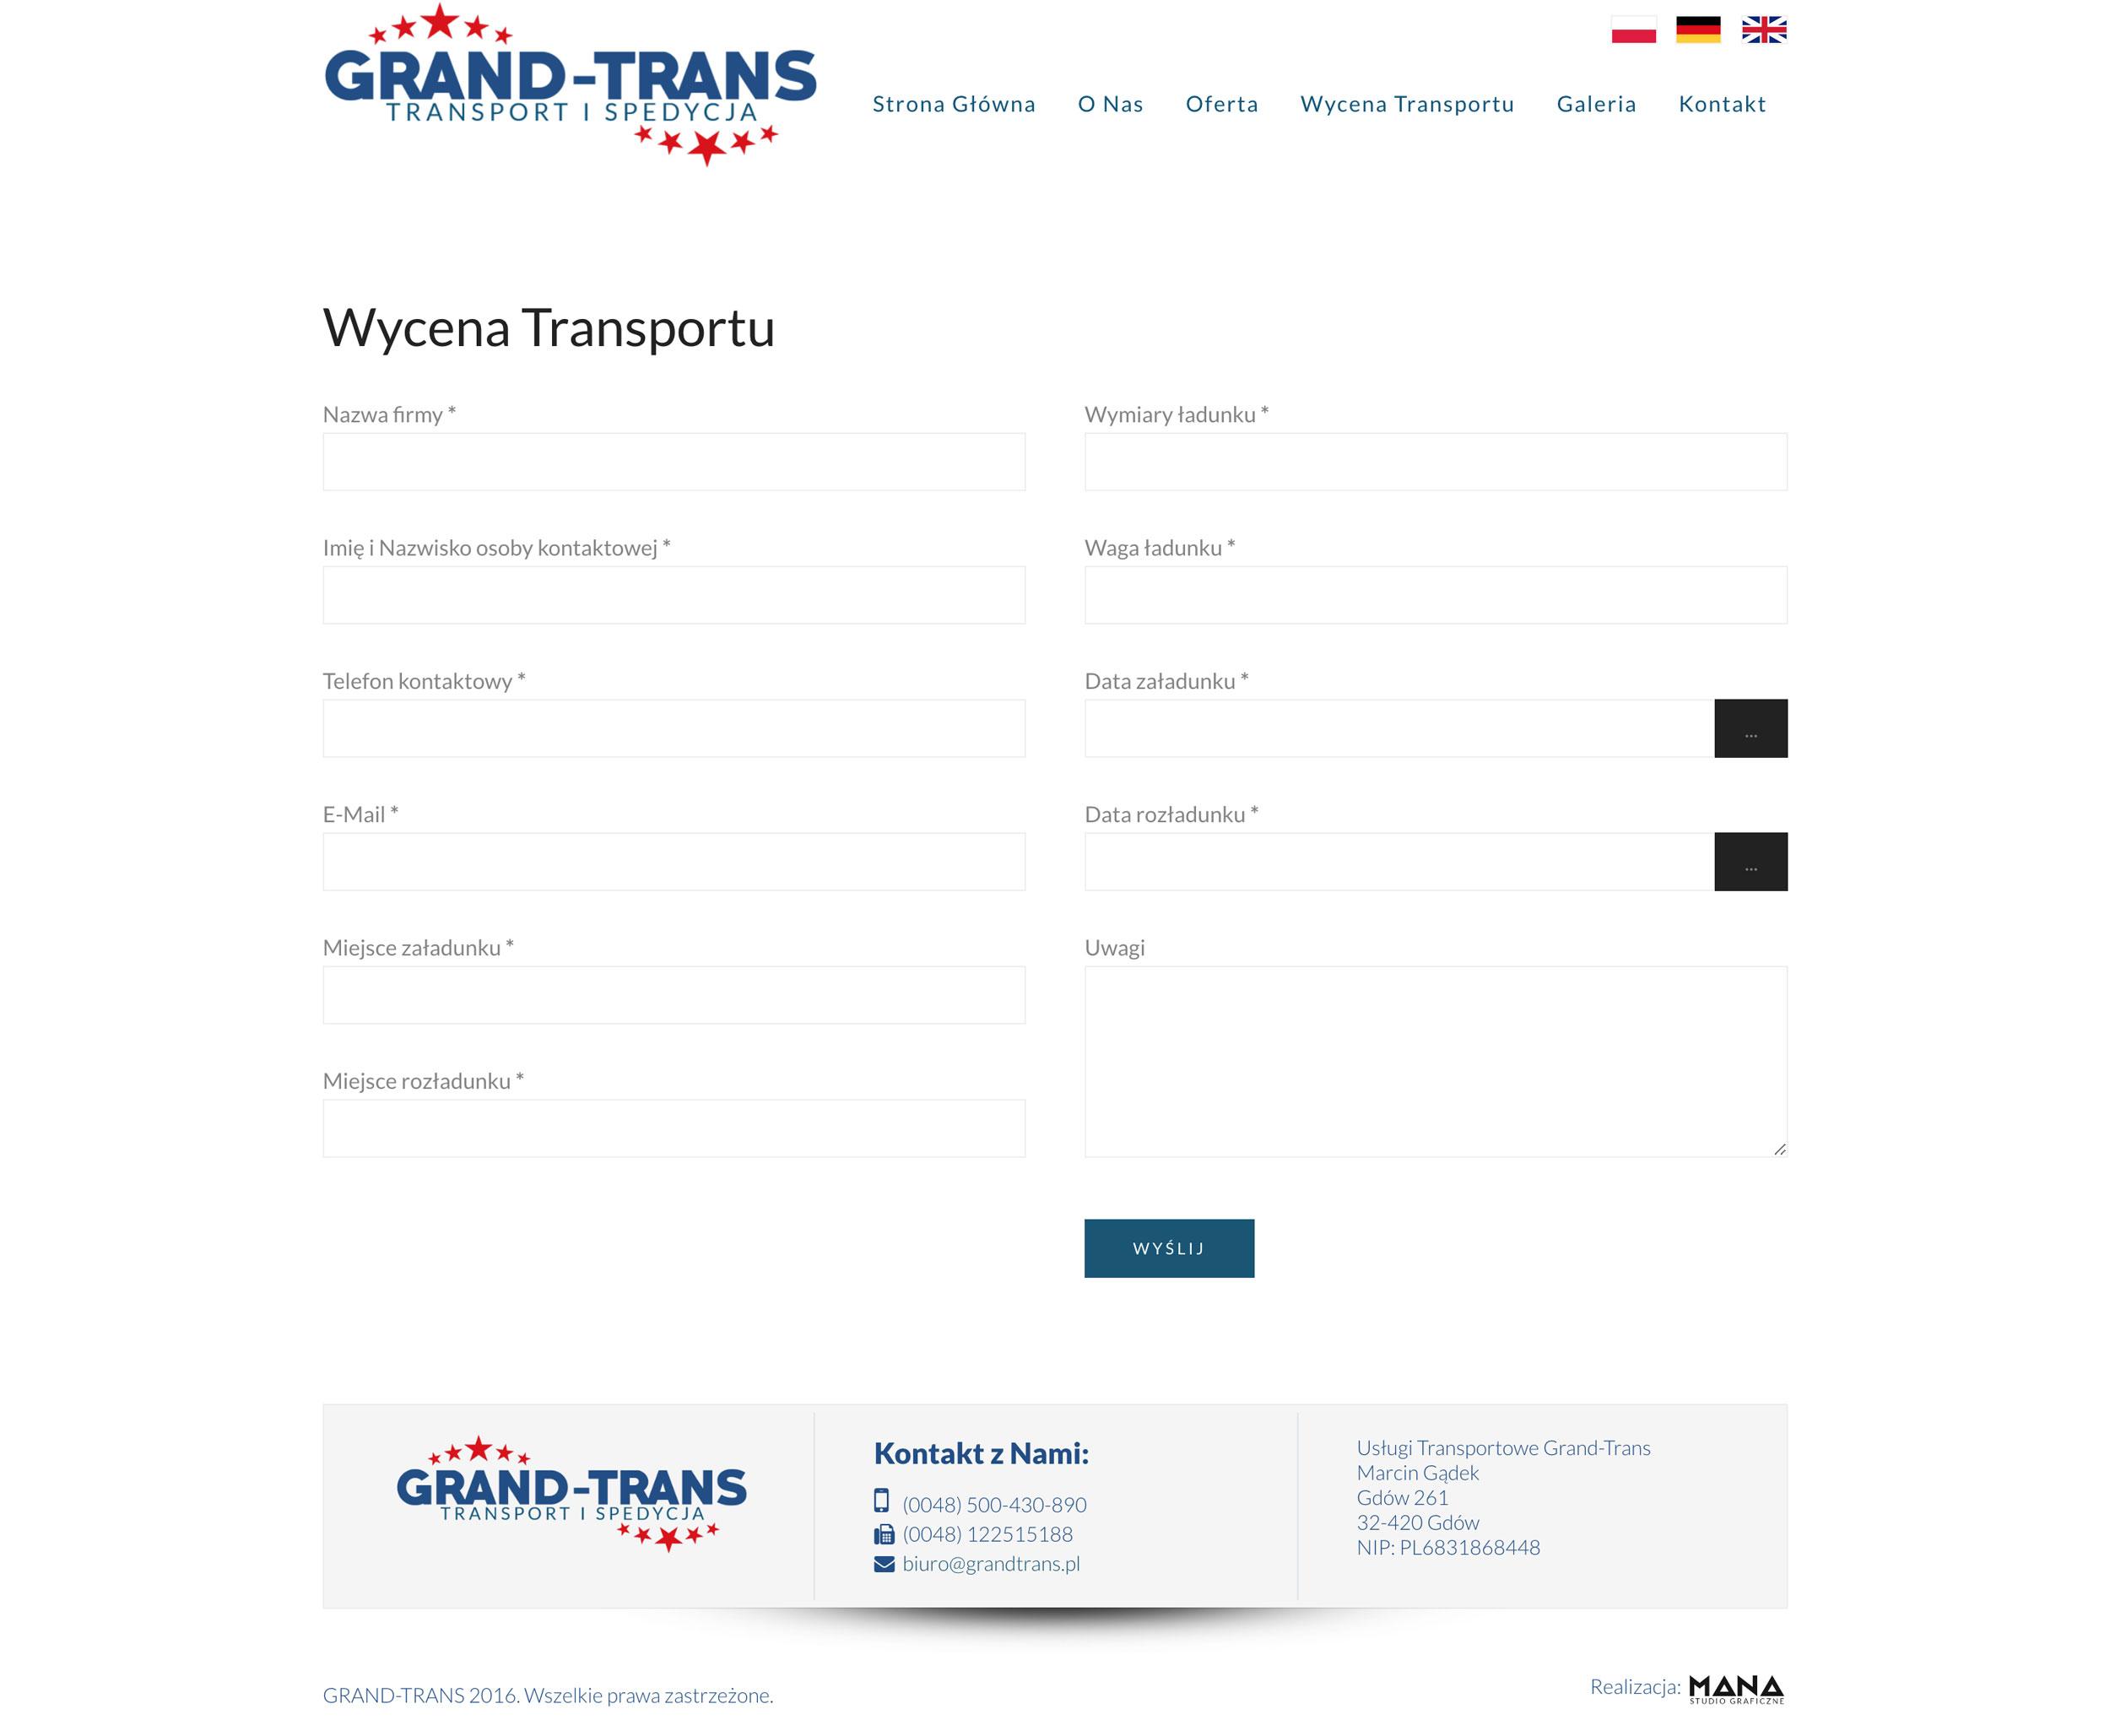 Grand-Trans - Wycena Transportu